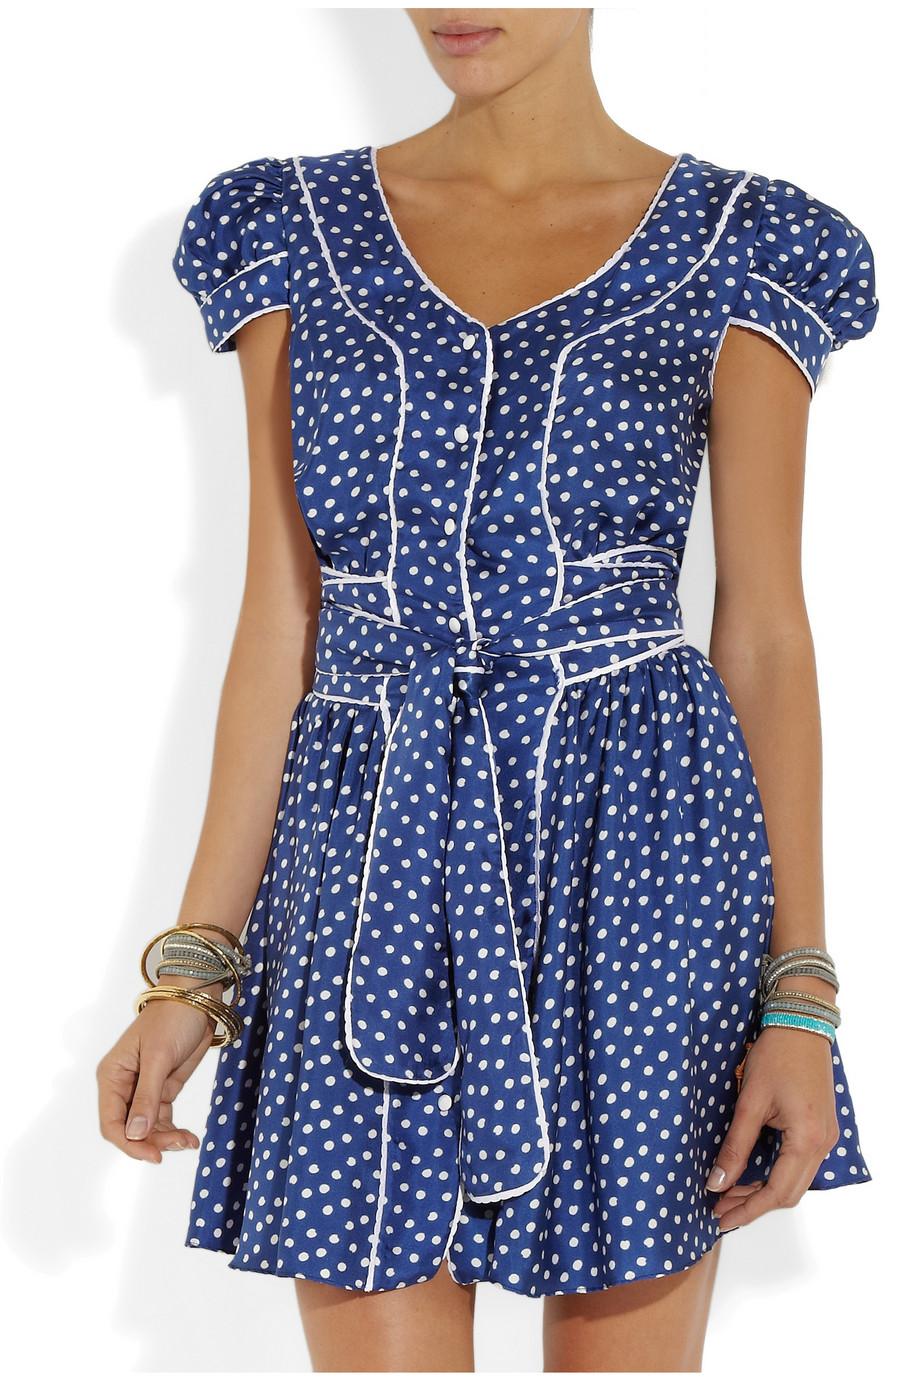 NAP_dress